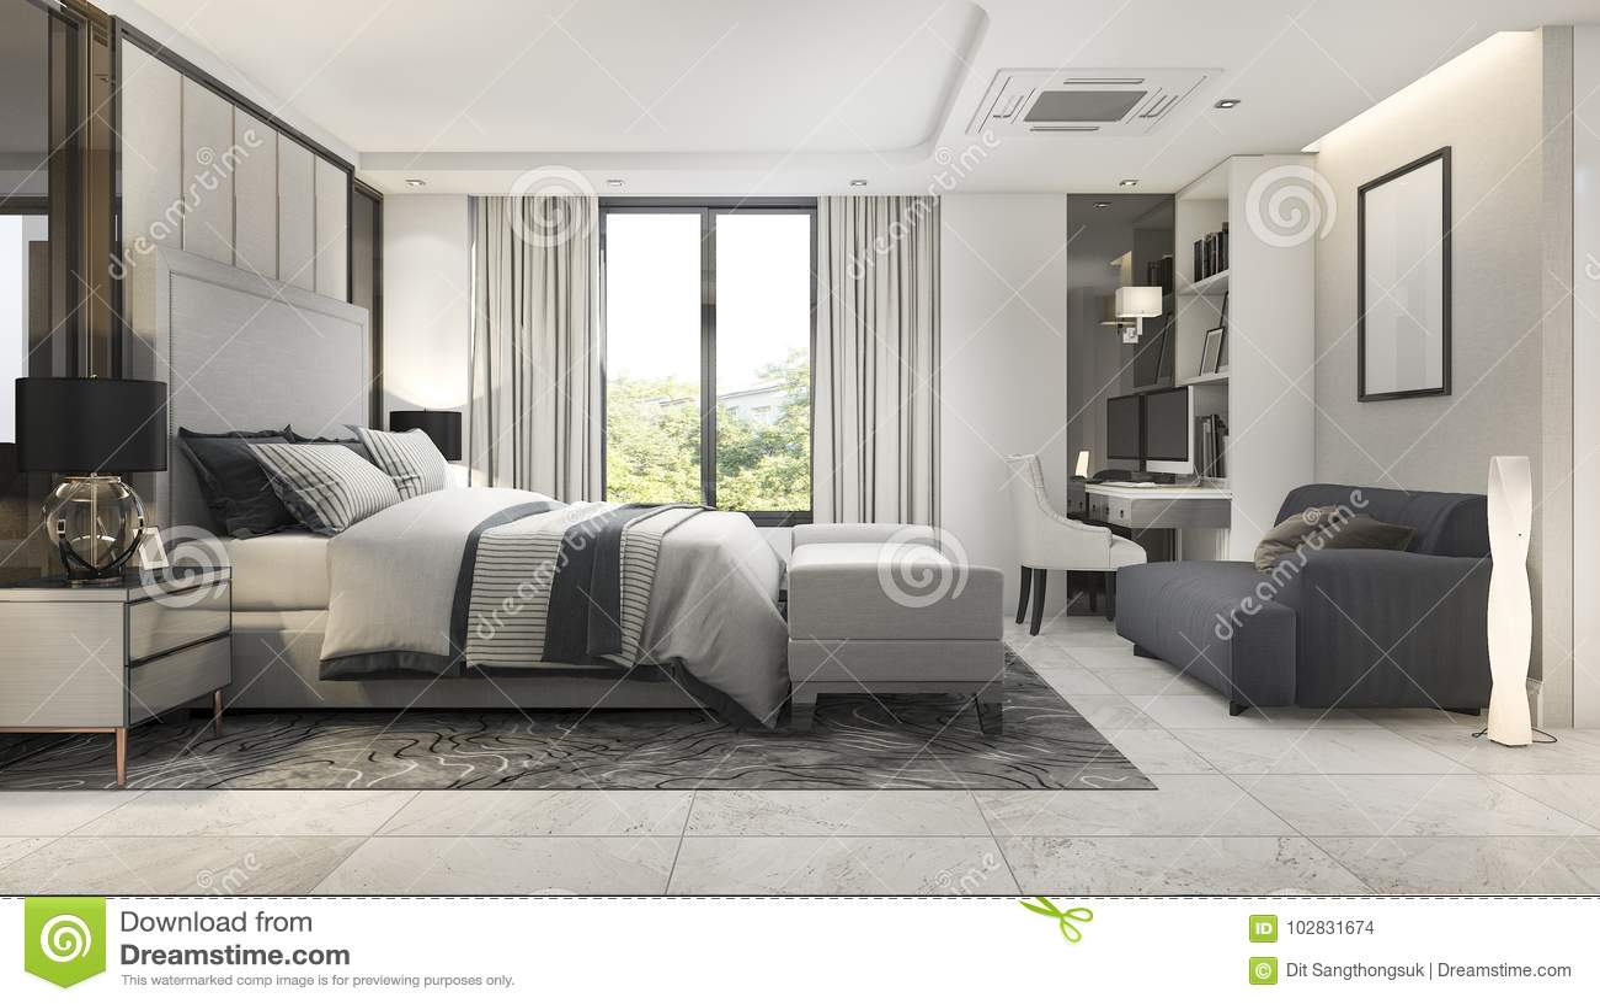 . 3d Rendering Modern Luxury Bedroom Suite In Hotel With Decor Stock